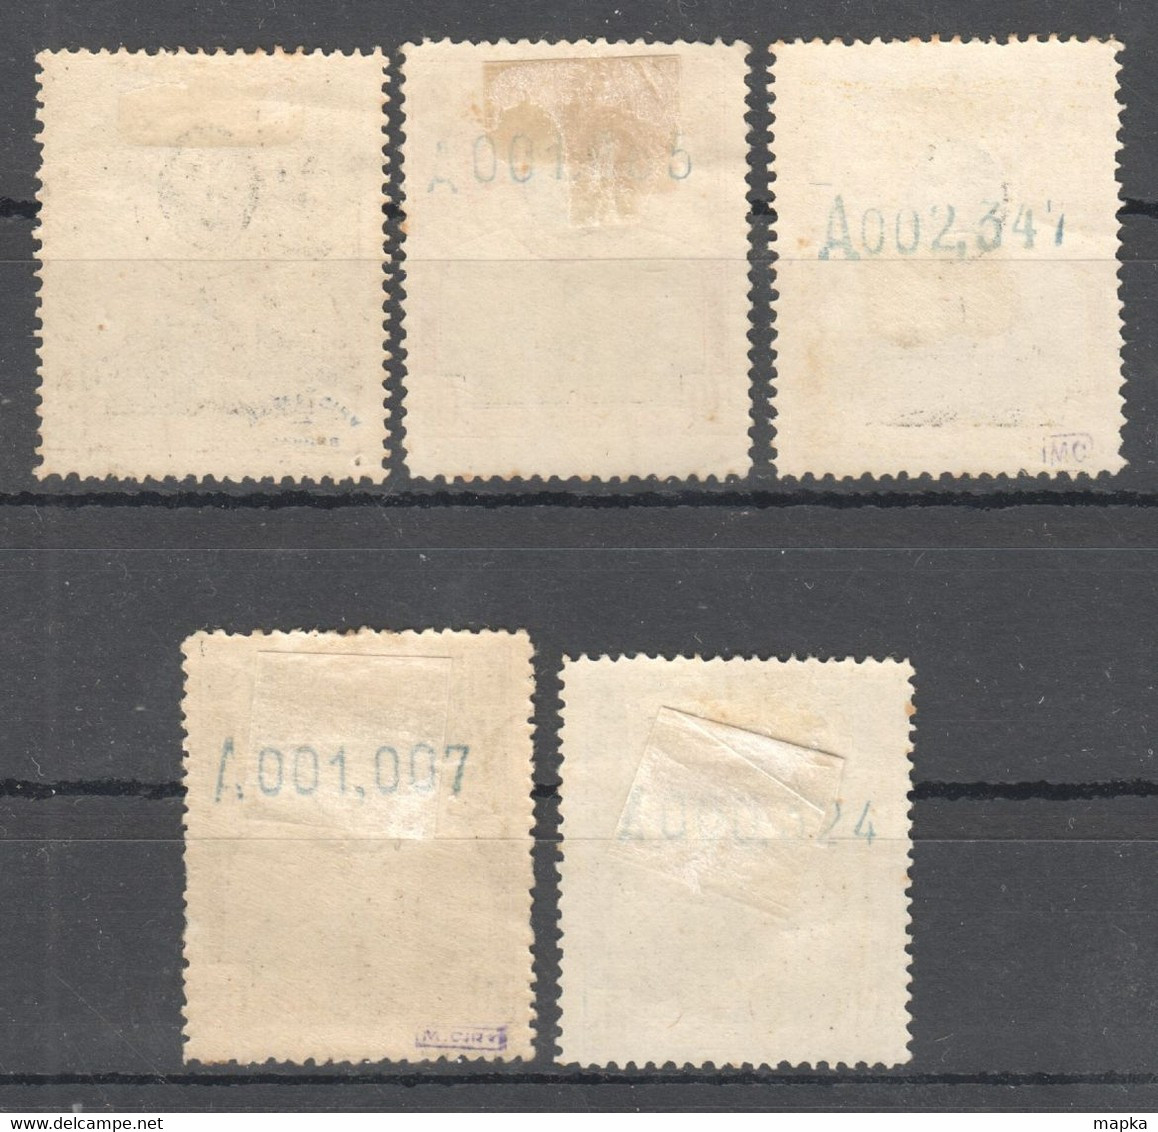 SP170 1920 SPAIN KINGDOM ALPHONSE XIII UPU MICHEL #268,270-273 ~25 EURO 5ST MLH - Unused Stamps